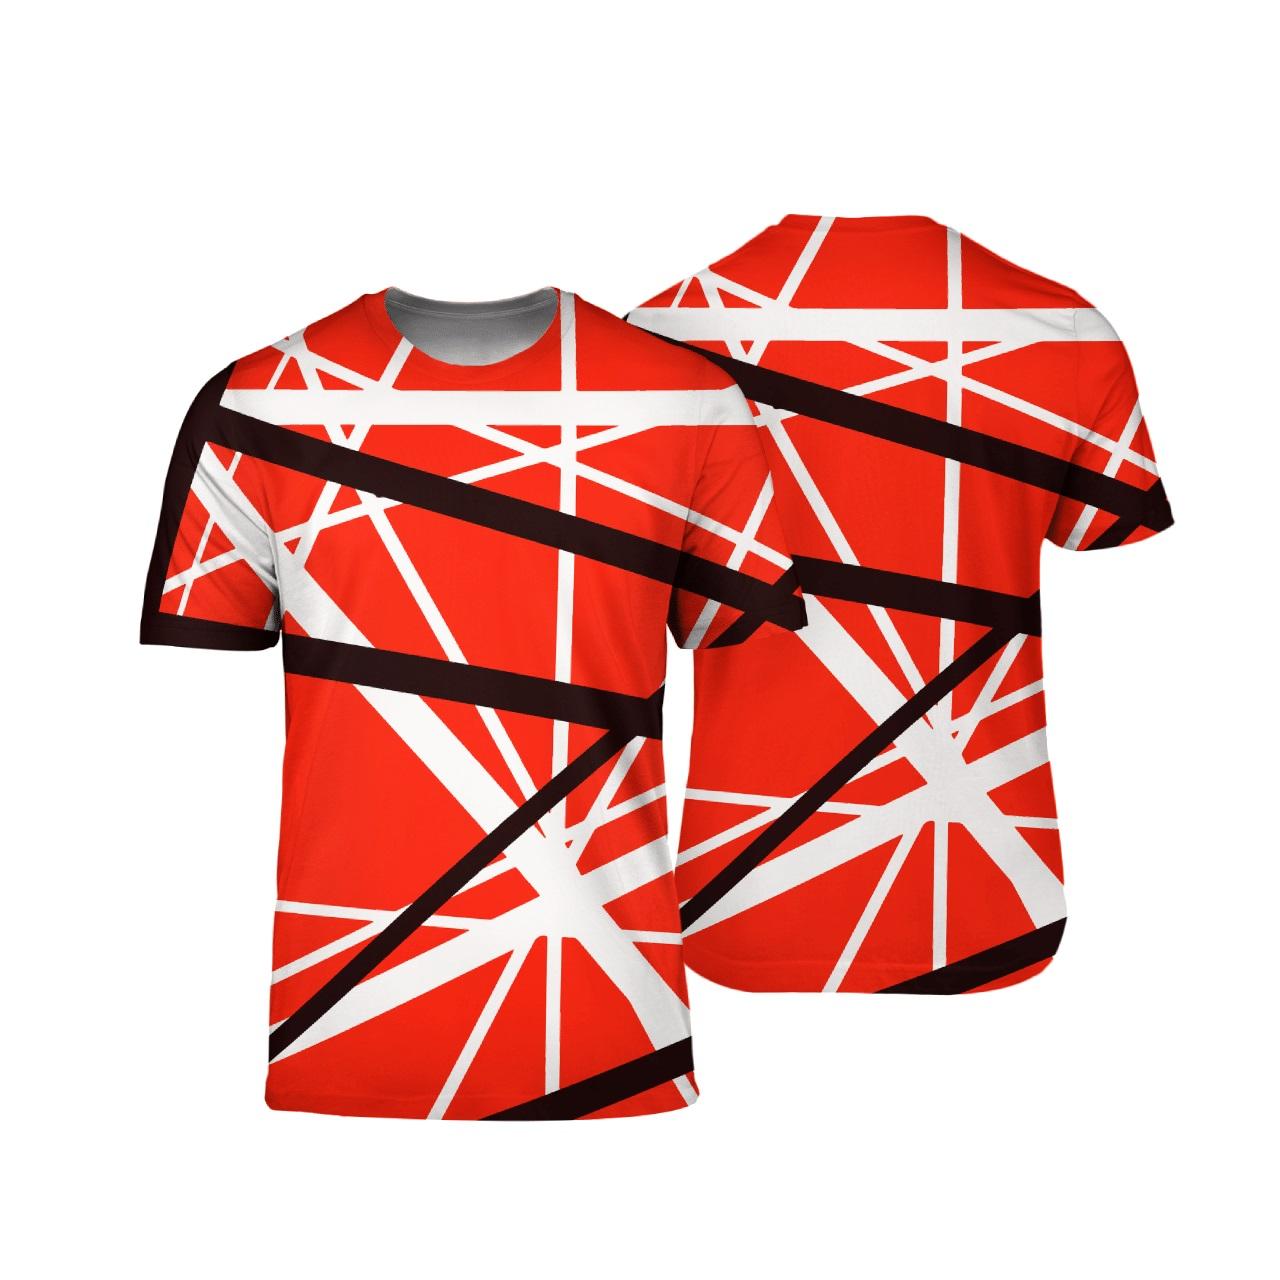 Eddie van halen 3d t-shirt